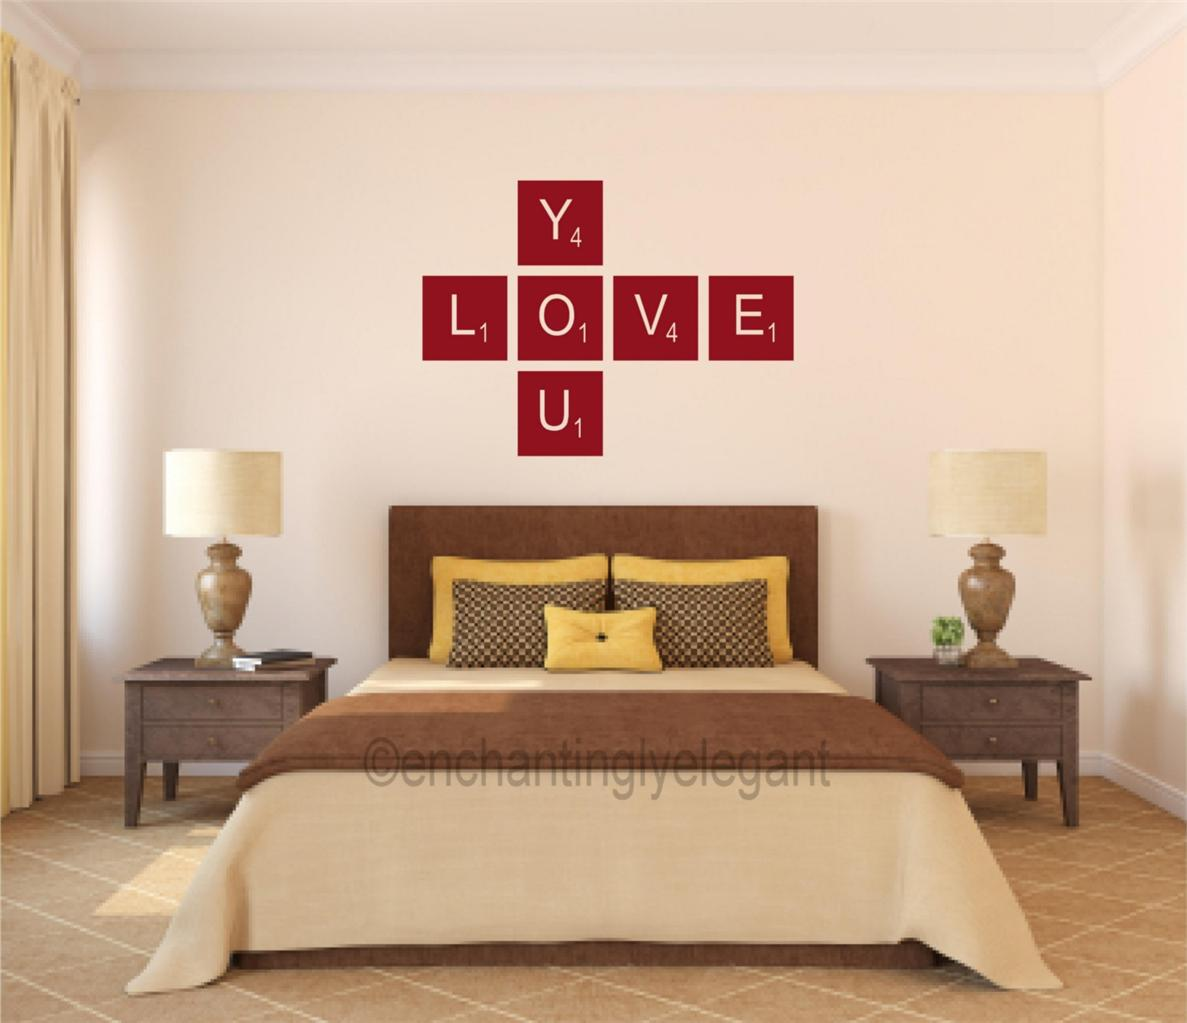 Love you scrabble tiles vinyl decal wall sticker words - Teen room wall decor ...